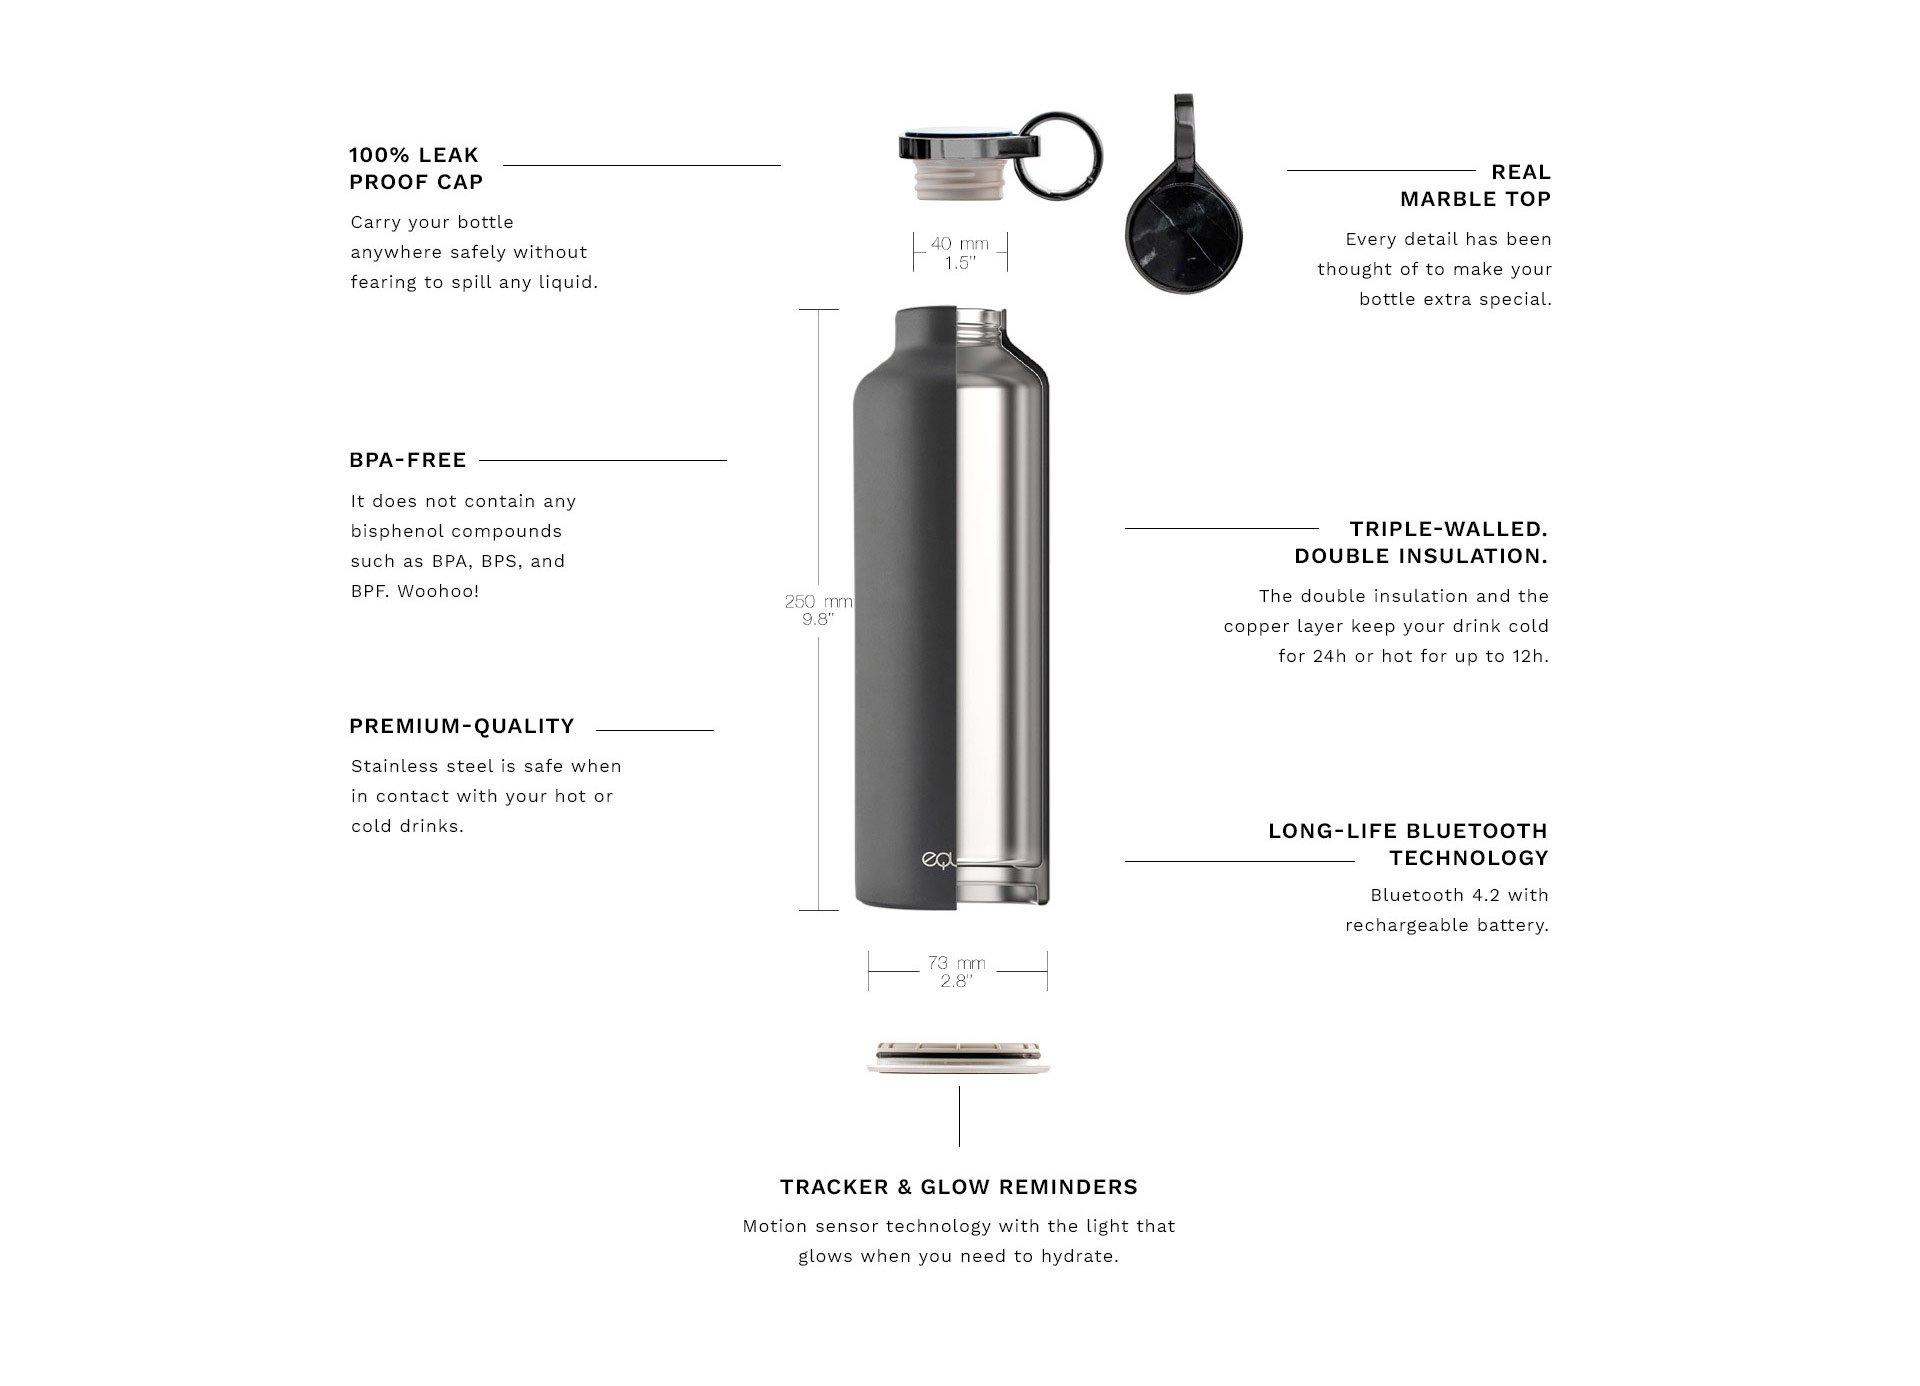 smart water design illustration